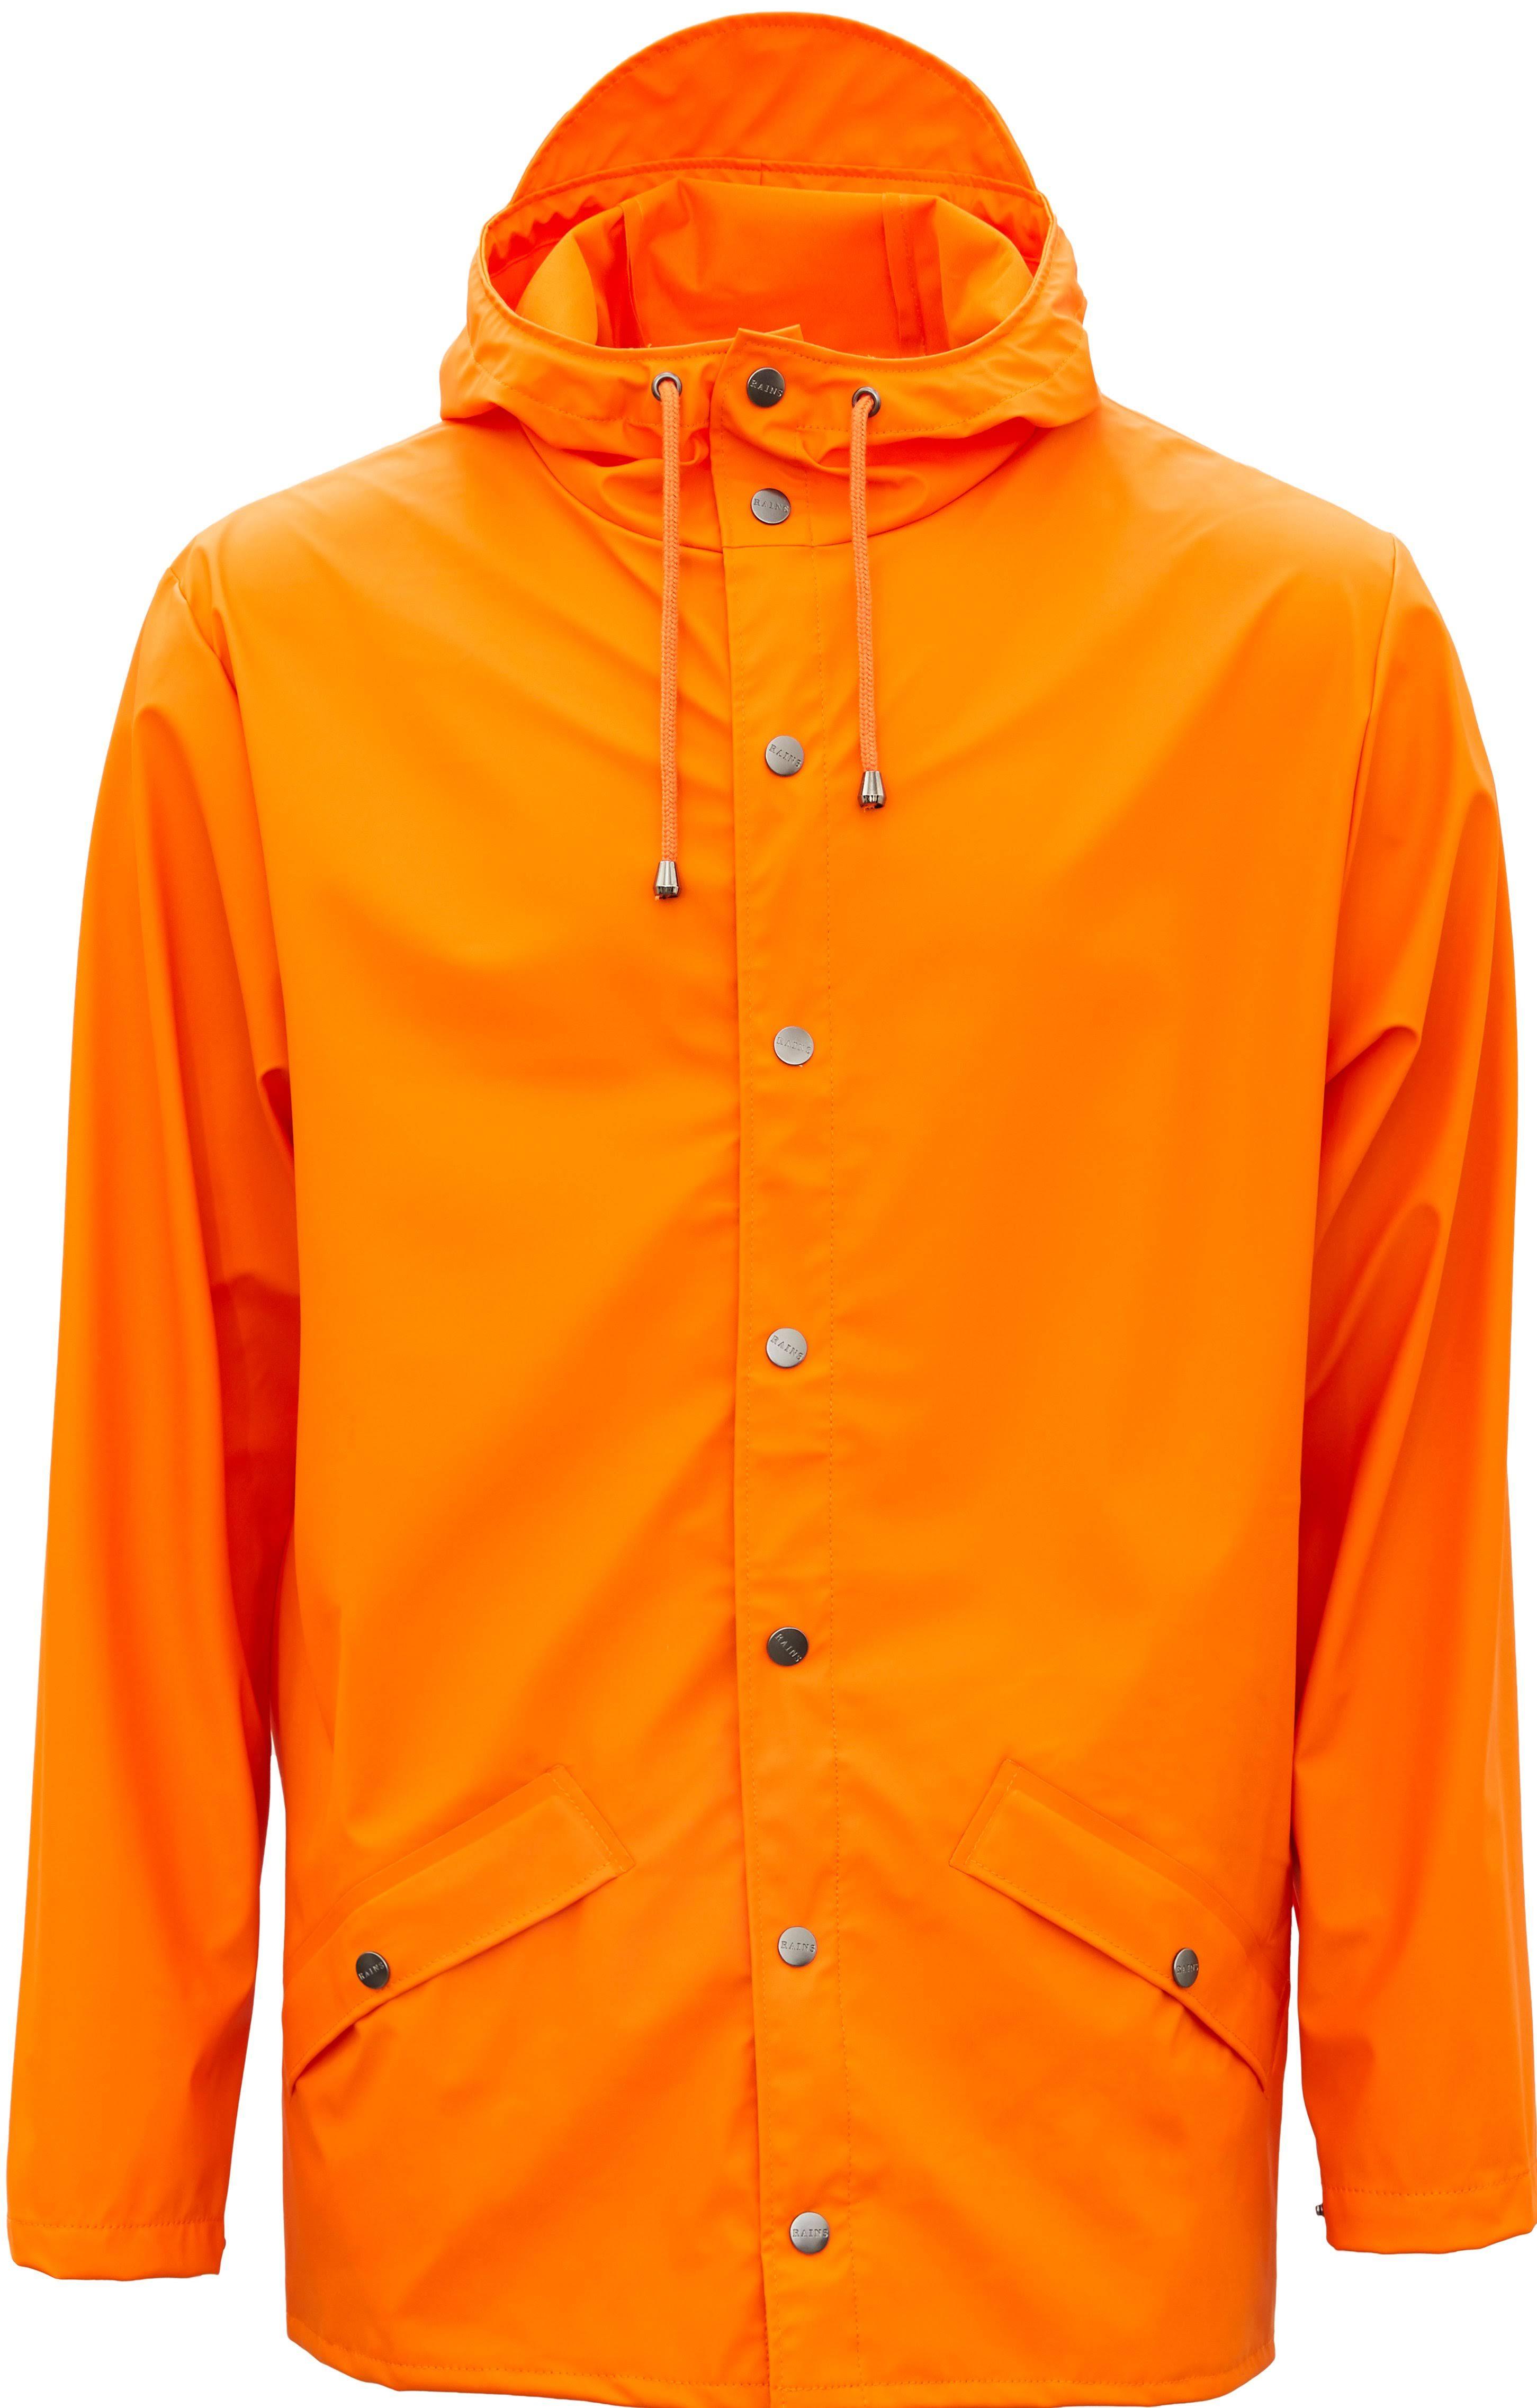 Chubascos Clásica Chaqueta Naranja Grande Fuego Lluvia 83 Mediana ZrZT4qwO